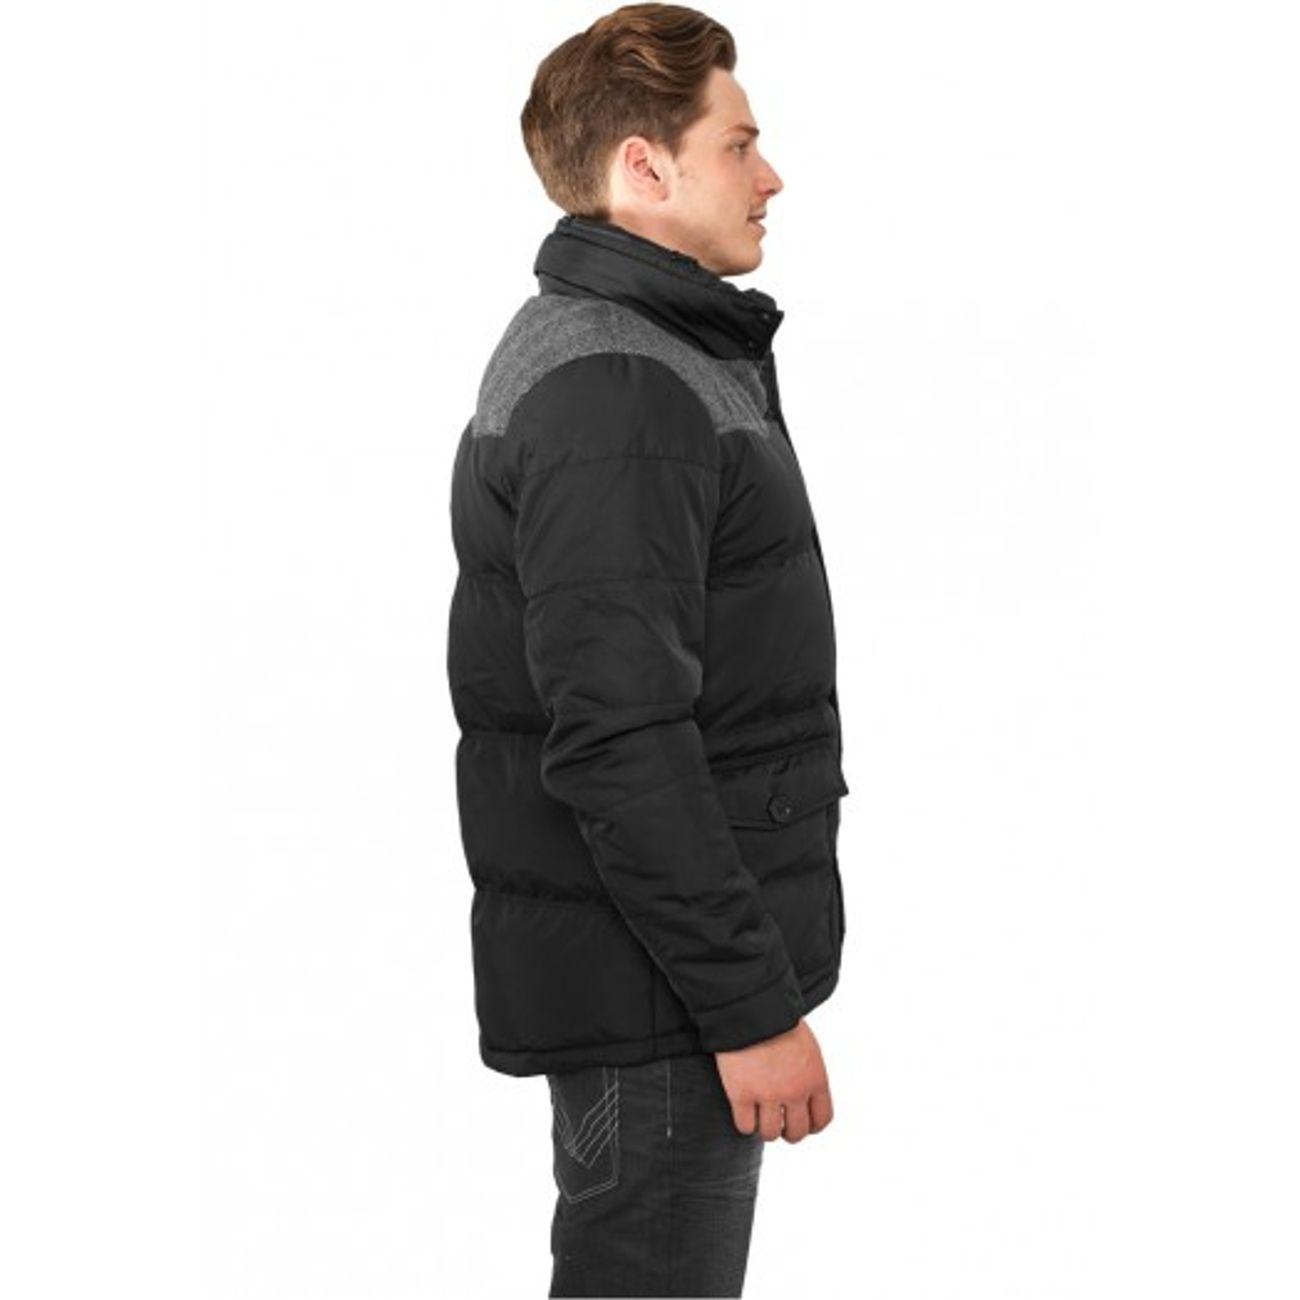 ... Mode- Lifestyle adulte URBAN CLASSICS Veste d hiver URBAN CLASSICS  Nylon Oxford Noir - 5c841feb06e1